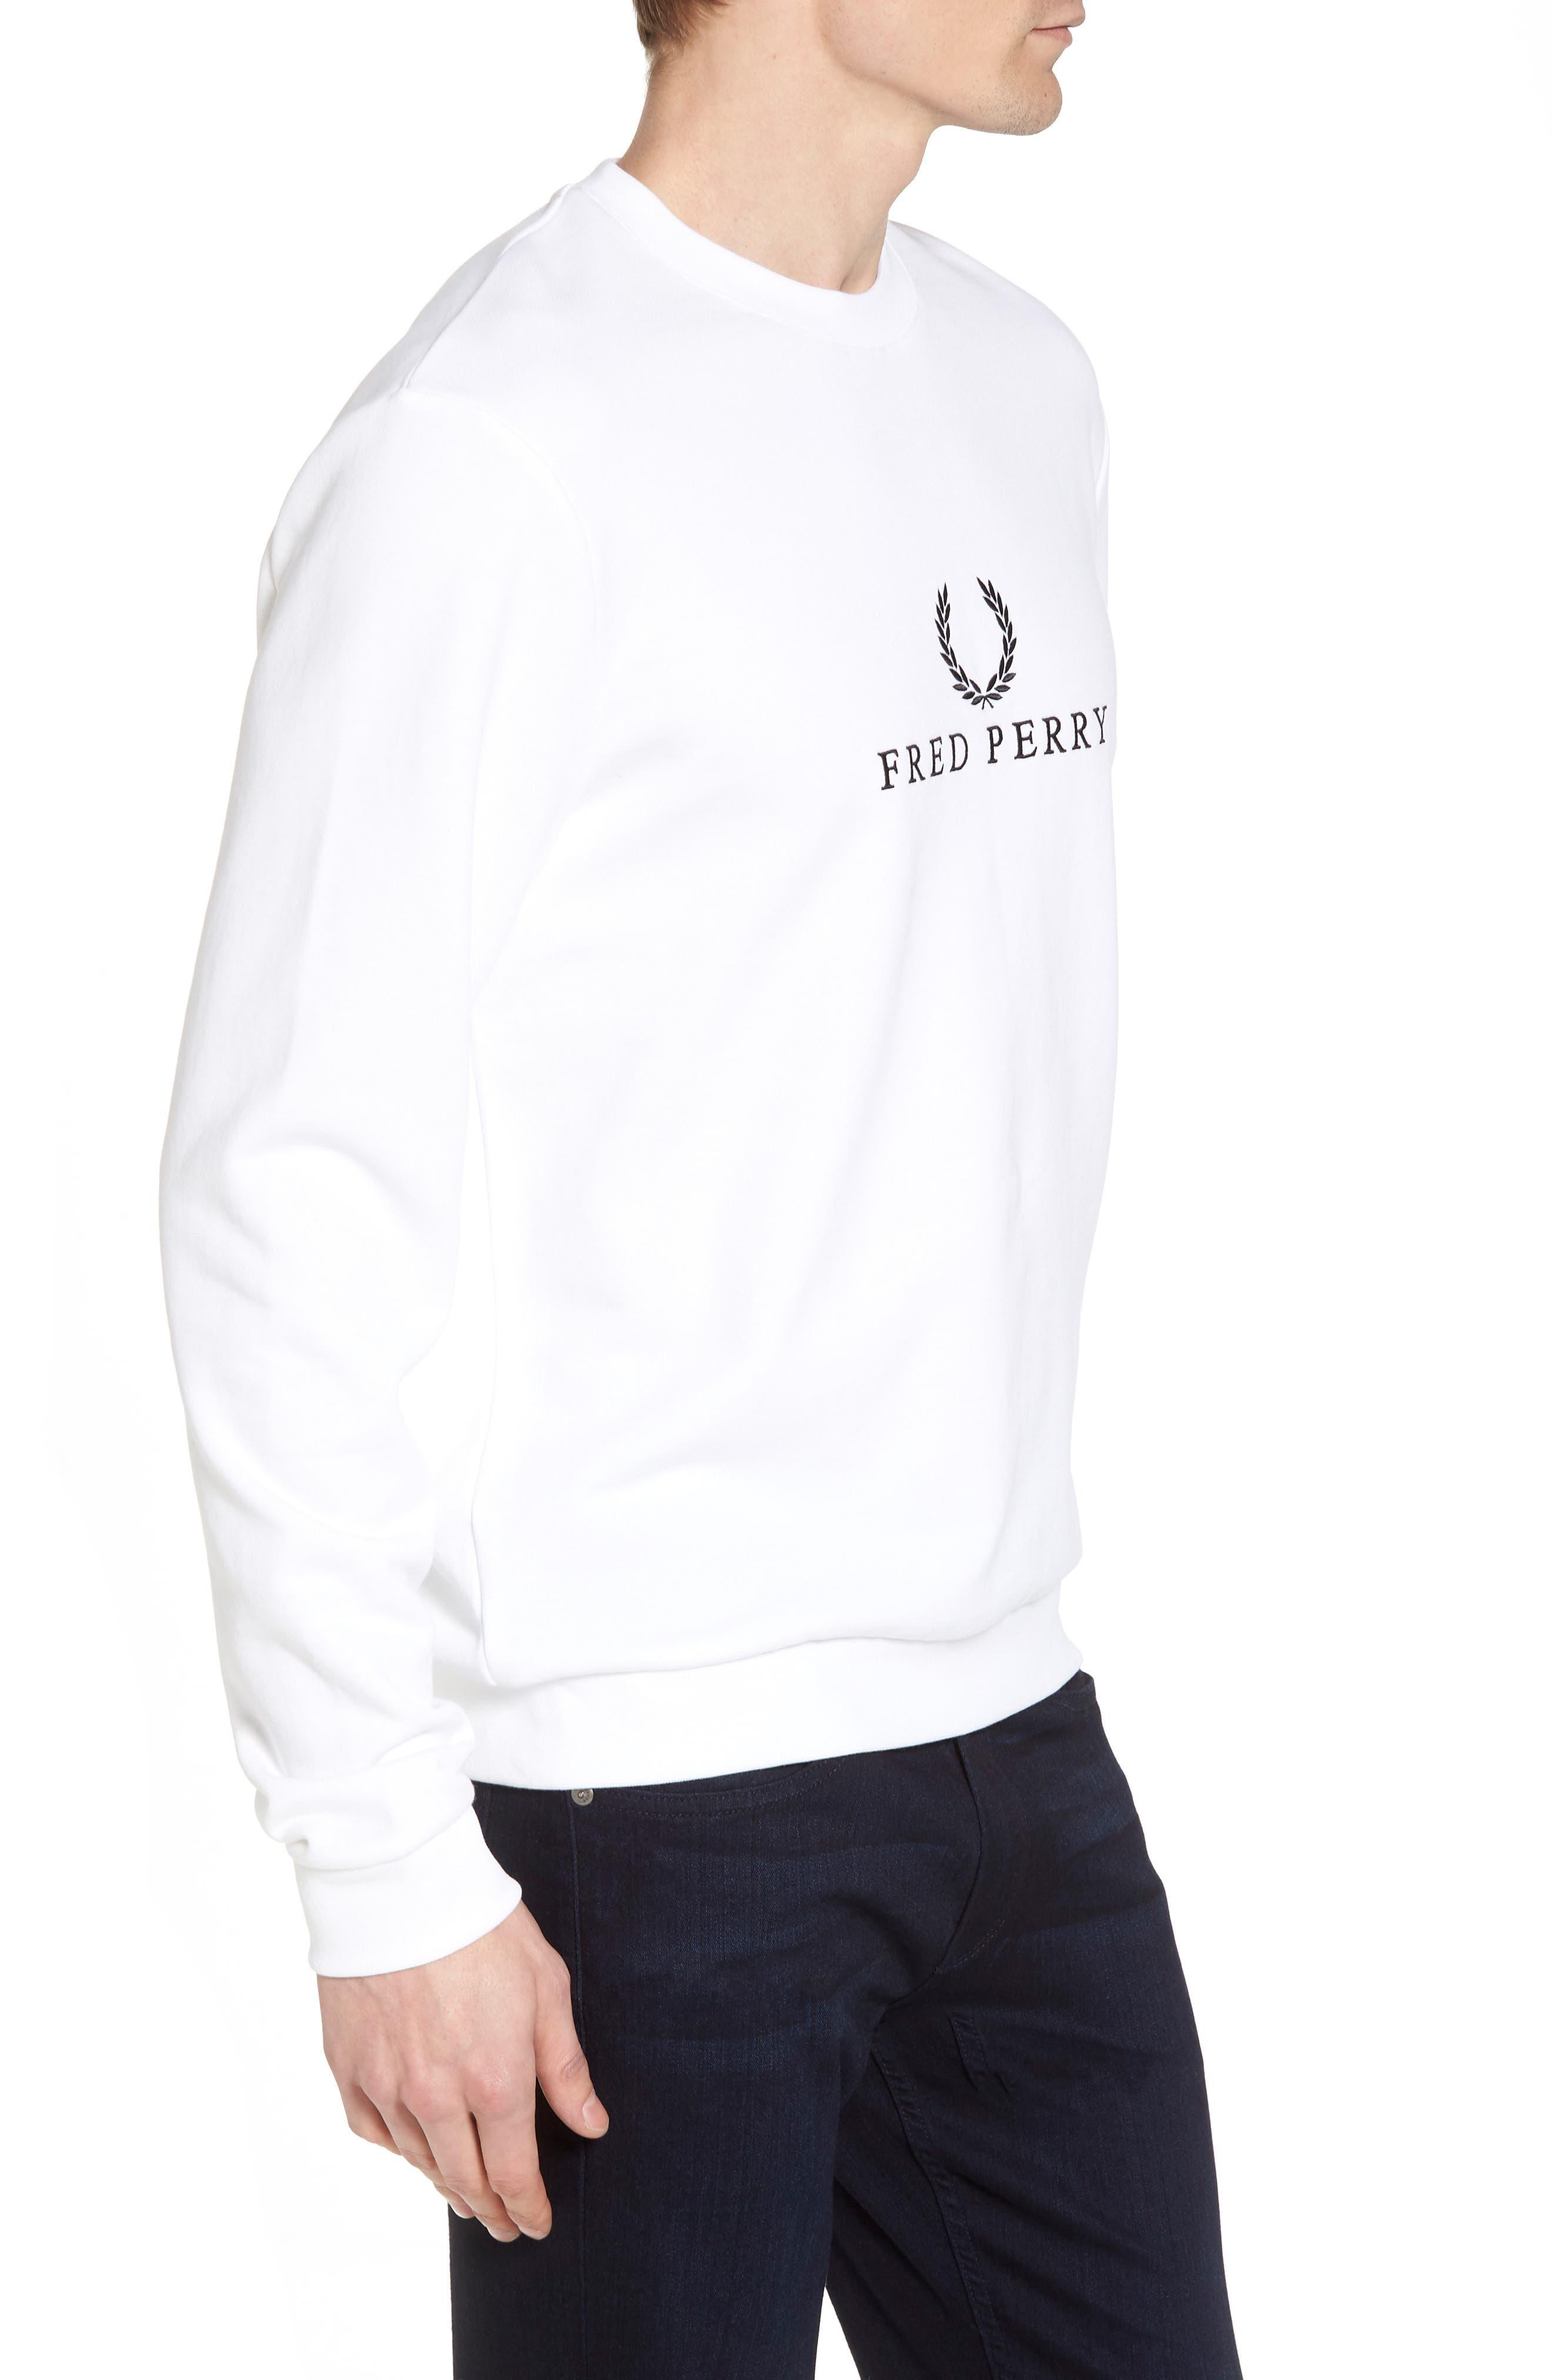 Tennis Sweatshirt,                             Alternate thumbnail 3, color,                             White